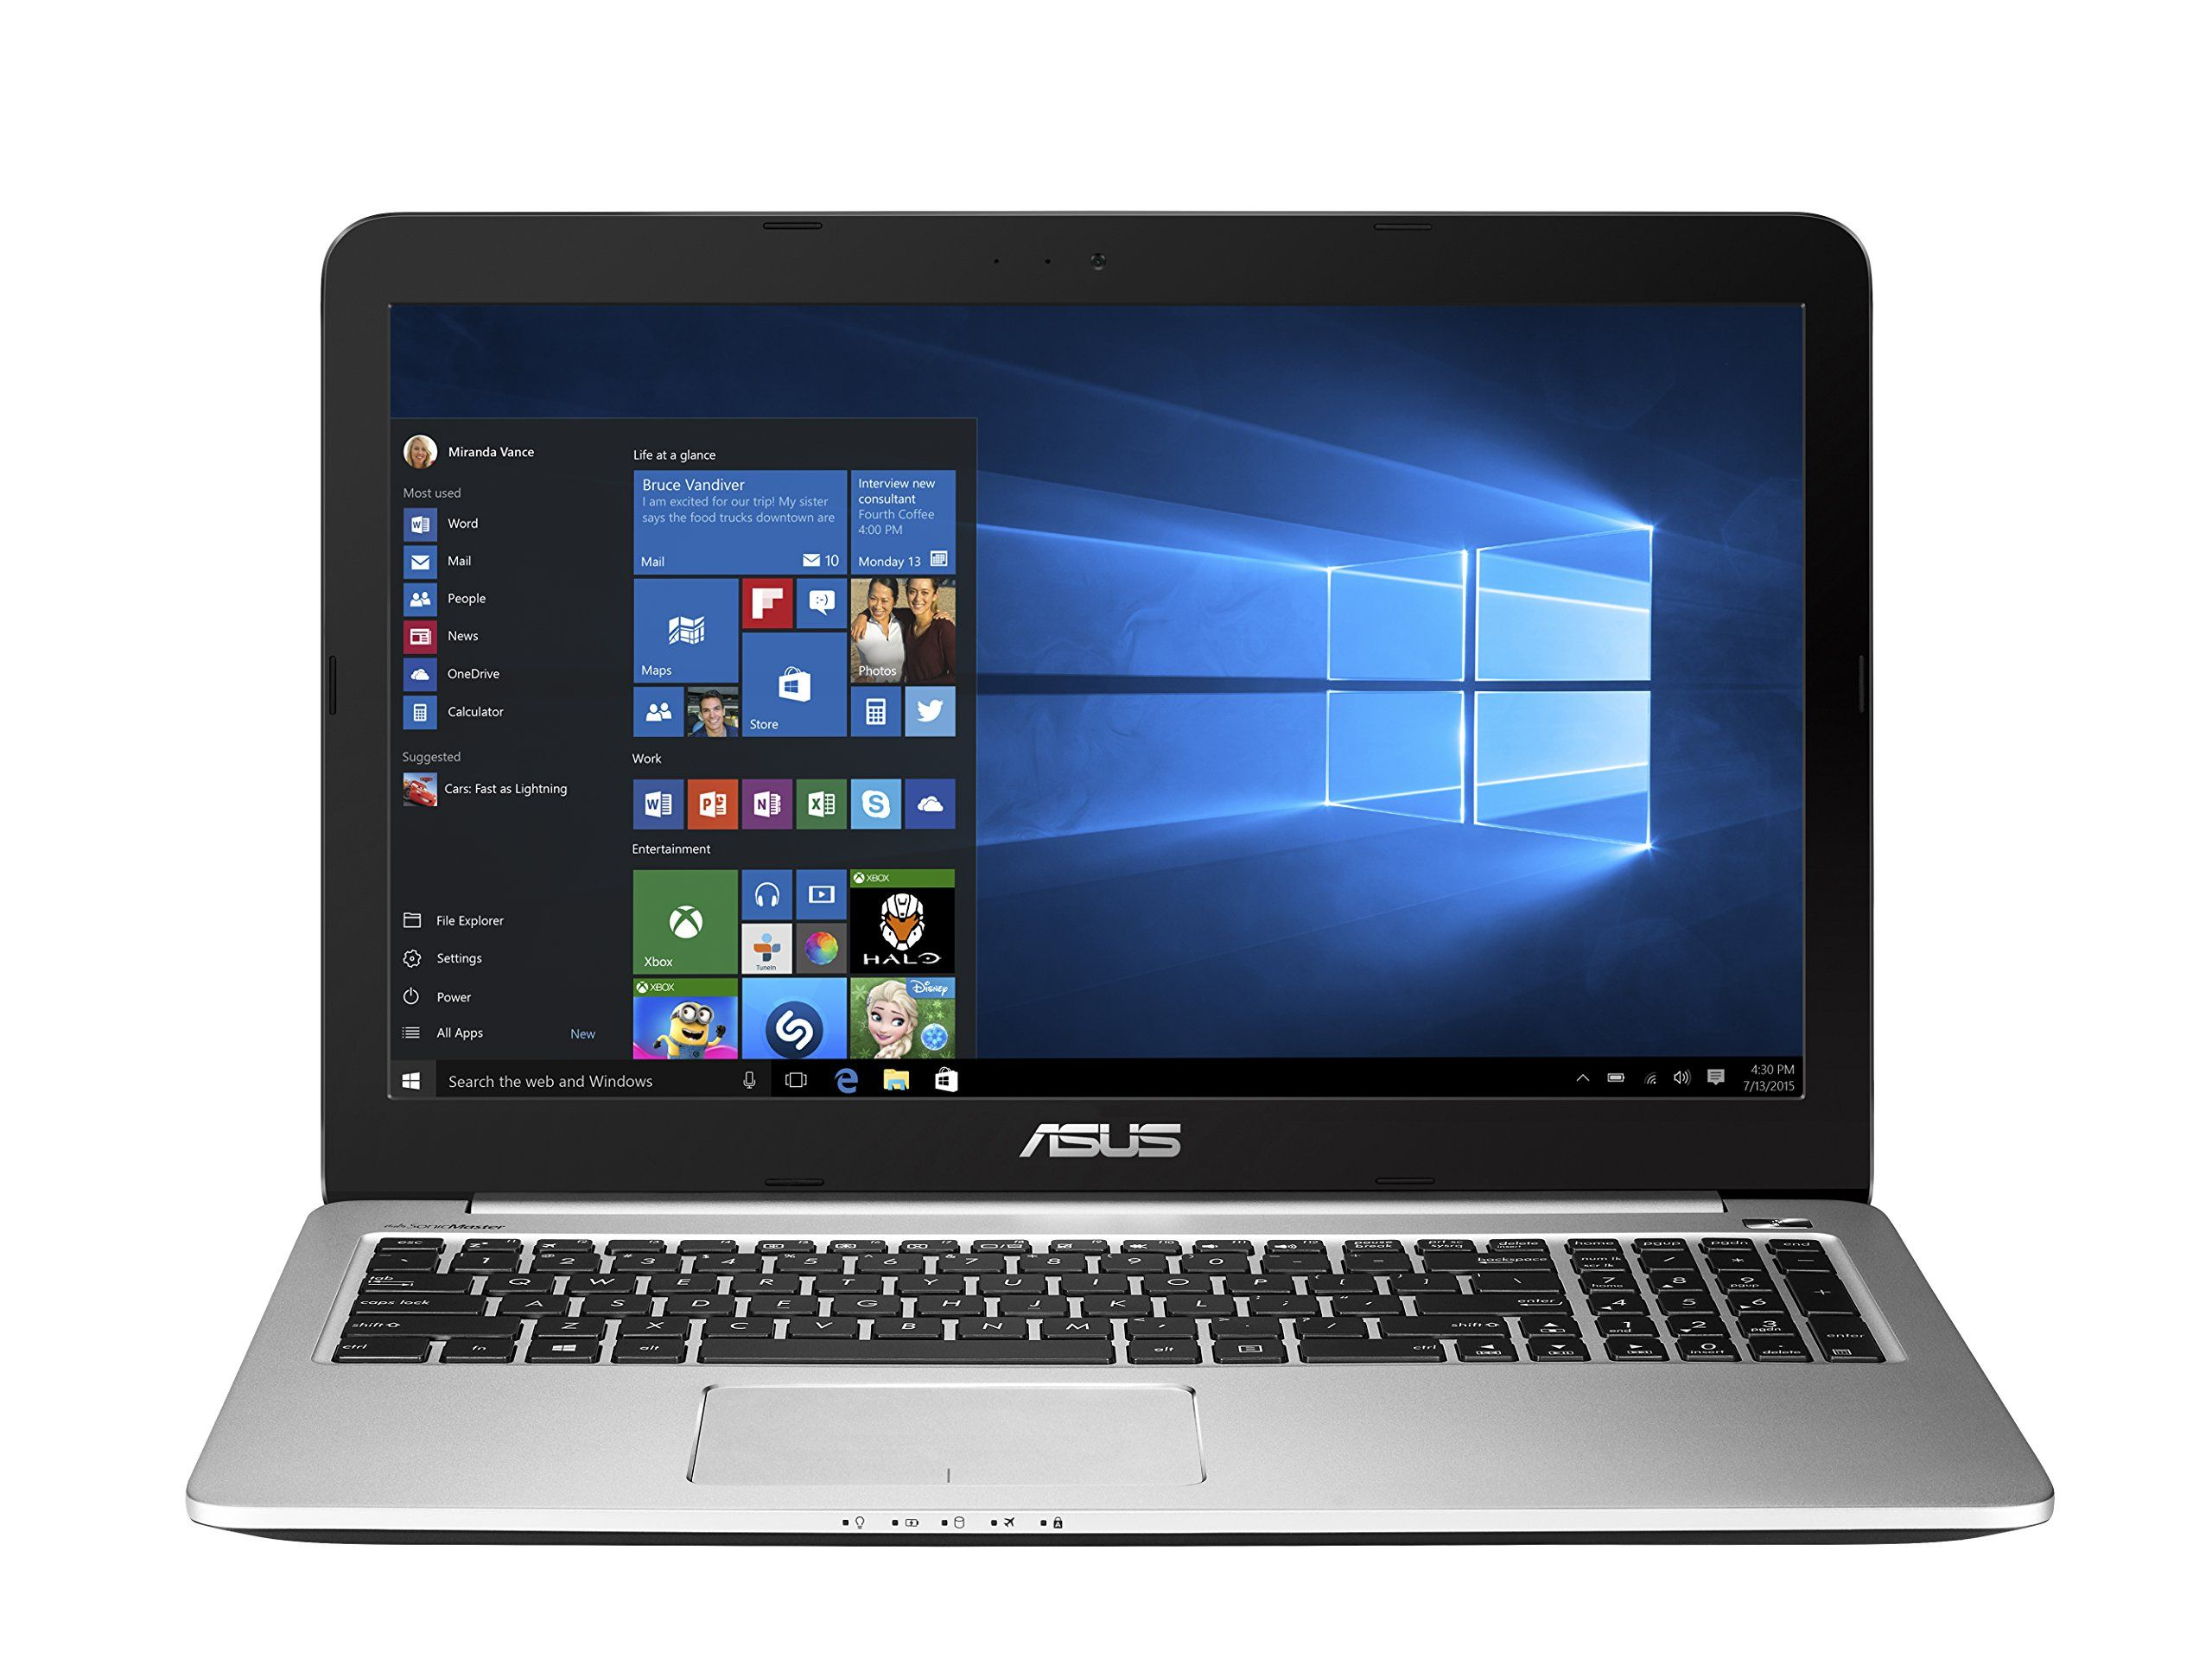 Asus K501ux 15 Inch Gaming Laptop Intel Core I7 Processor 8gb